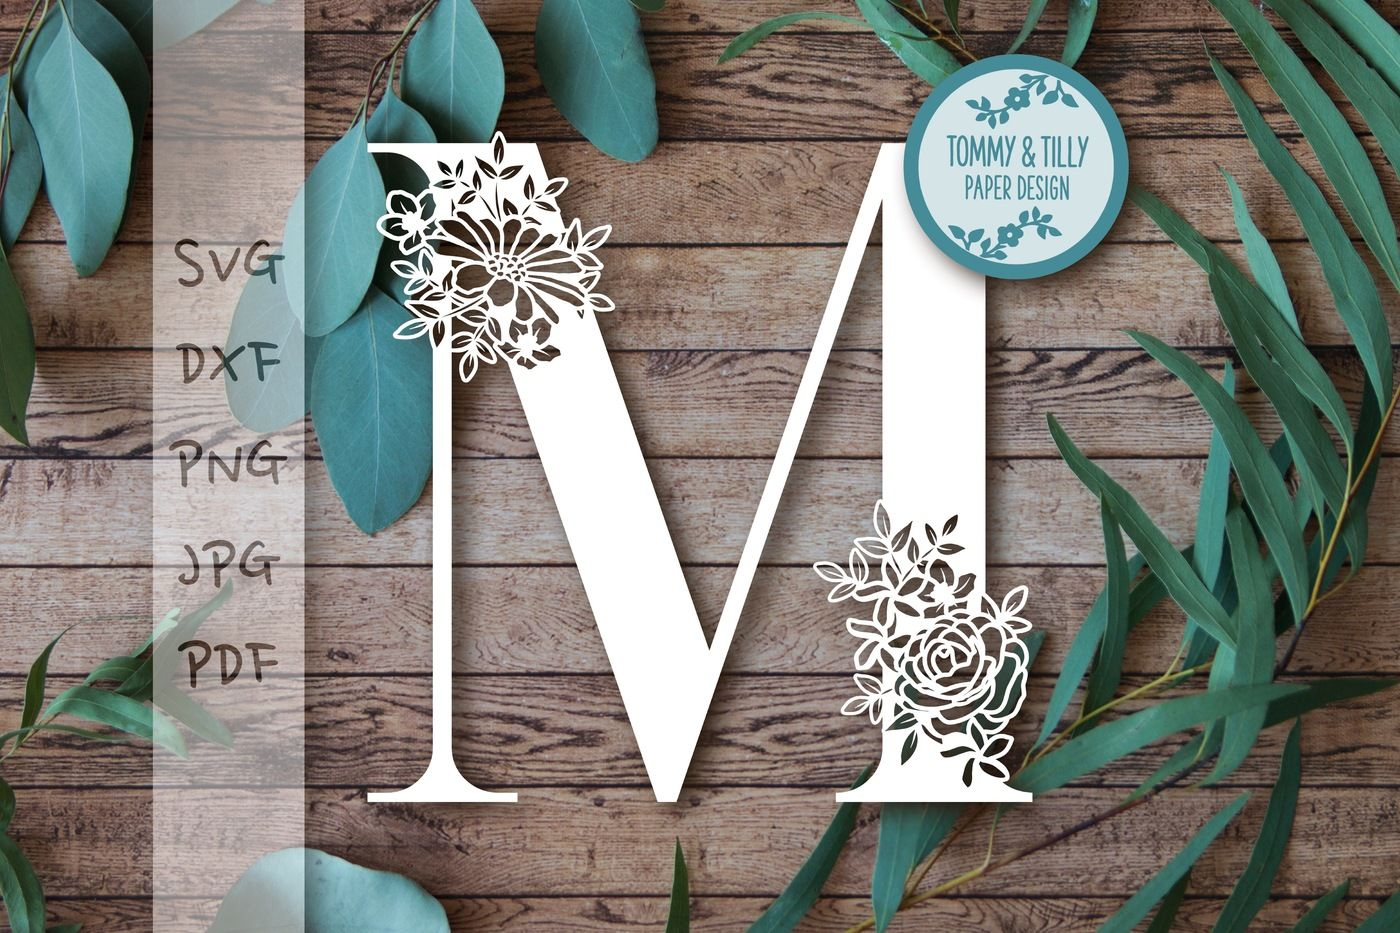 M Floral Letter Svg Dxf Png Pdf Jpg By Tommy And Tilly Design